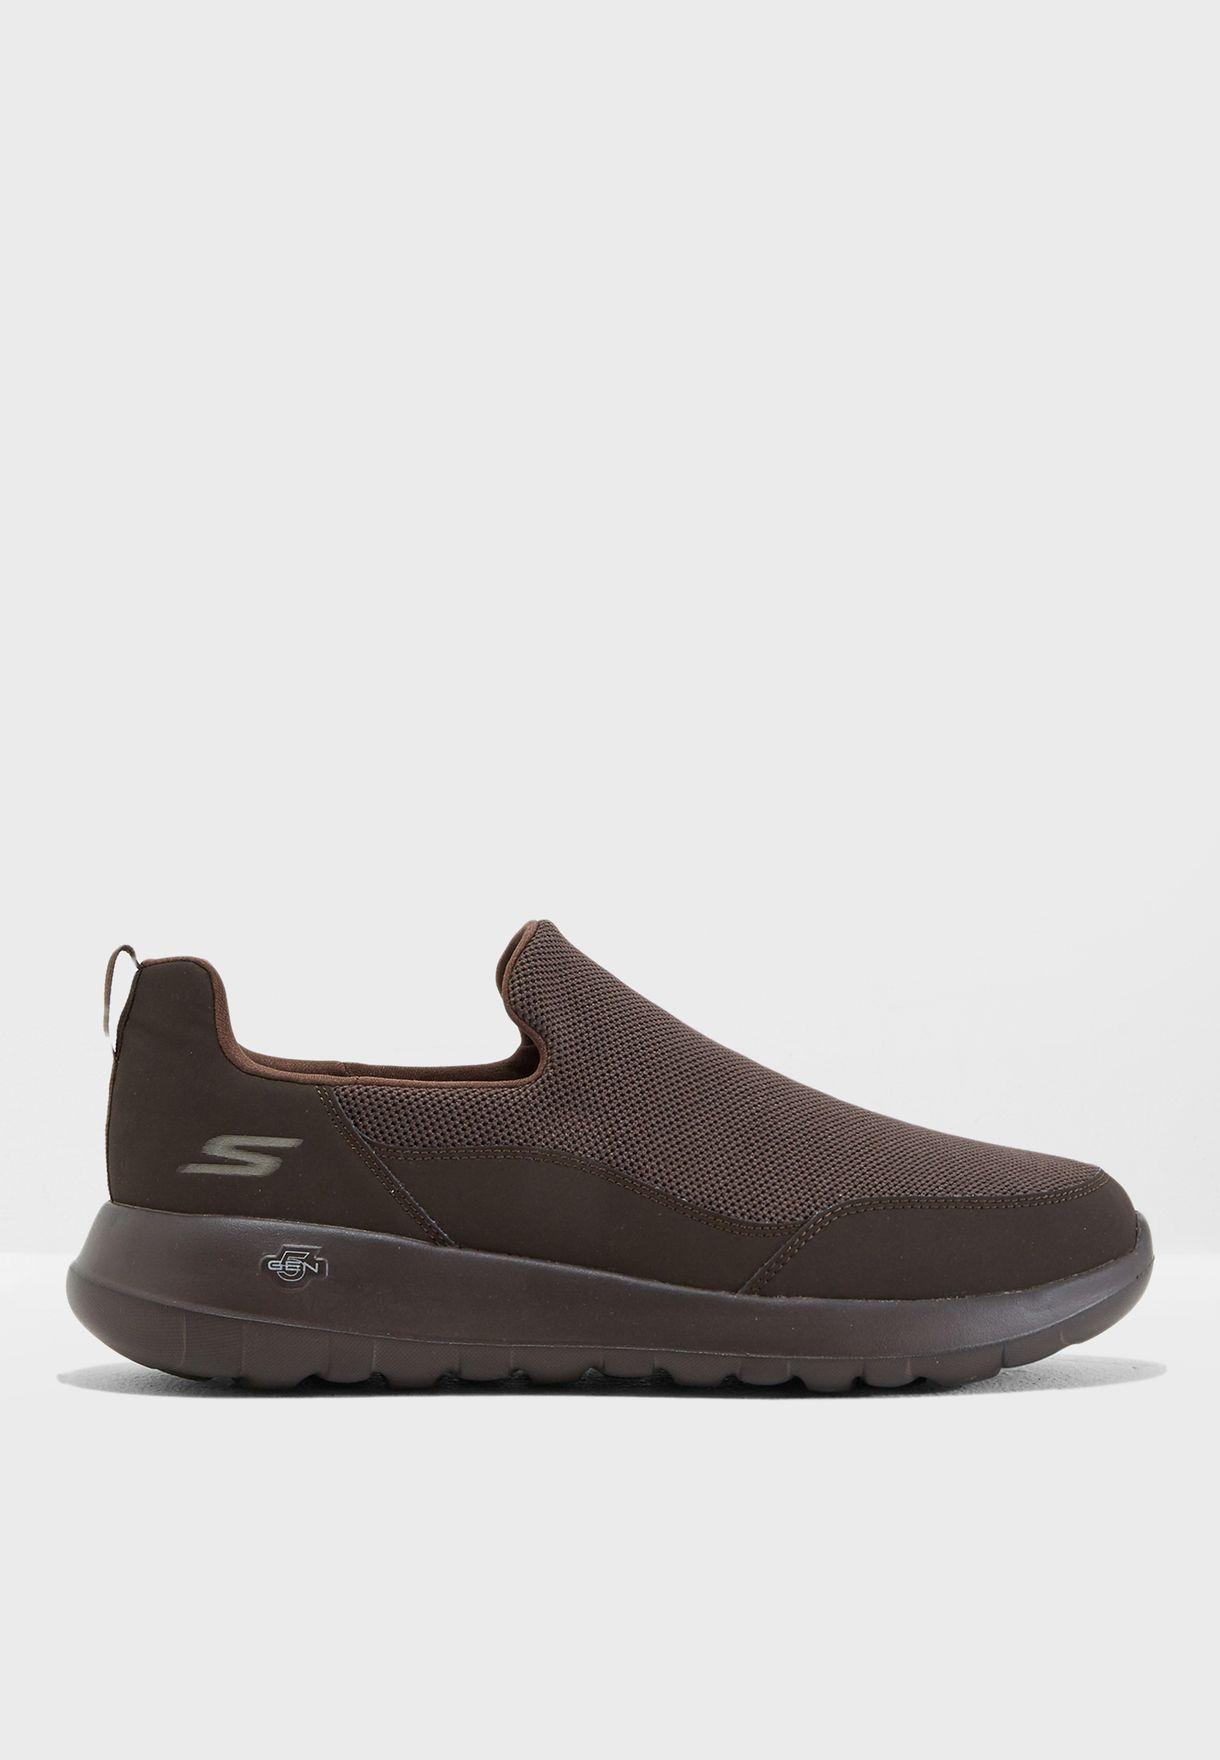 93471ac6632e Shop Skechers browns Go Walk Max 54626-CHOC for Men in UAE ...